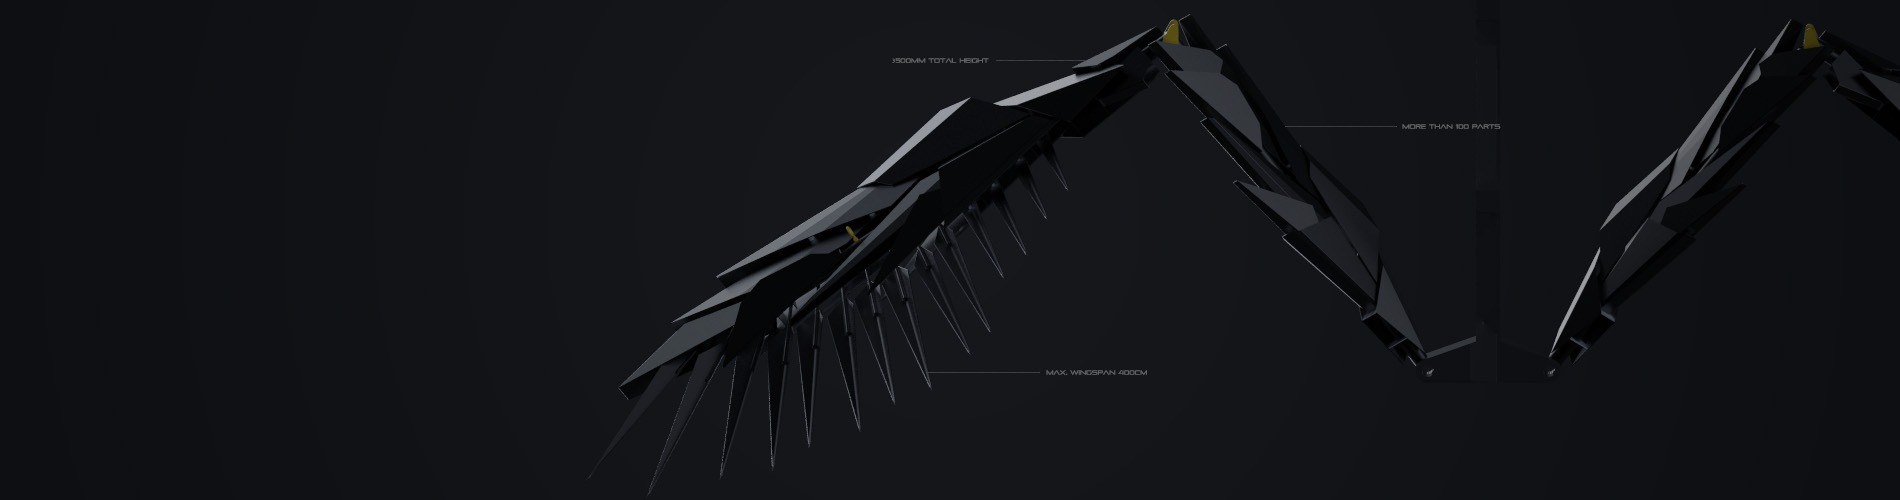 Kinetic-Sculpture-C7DESIGN1